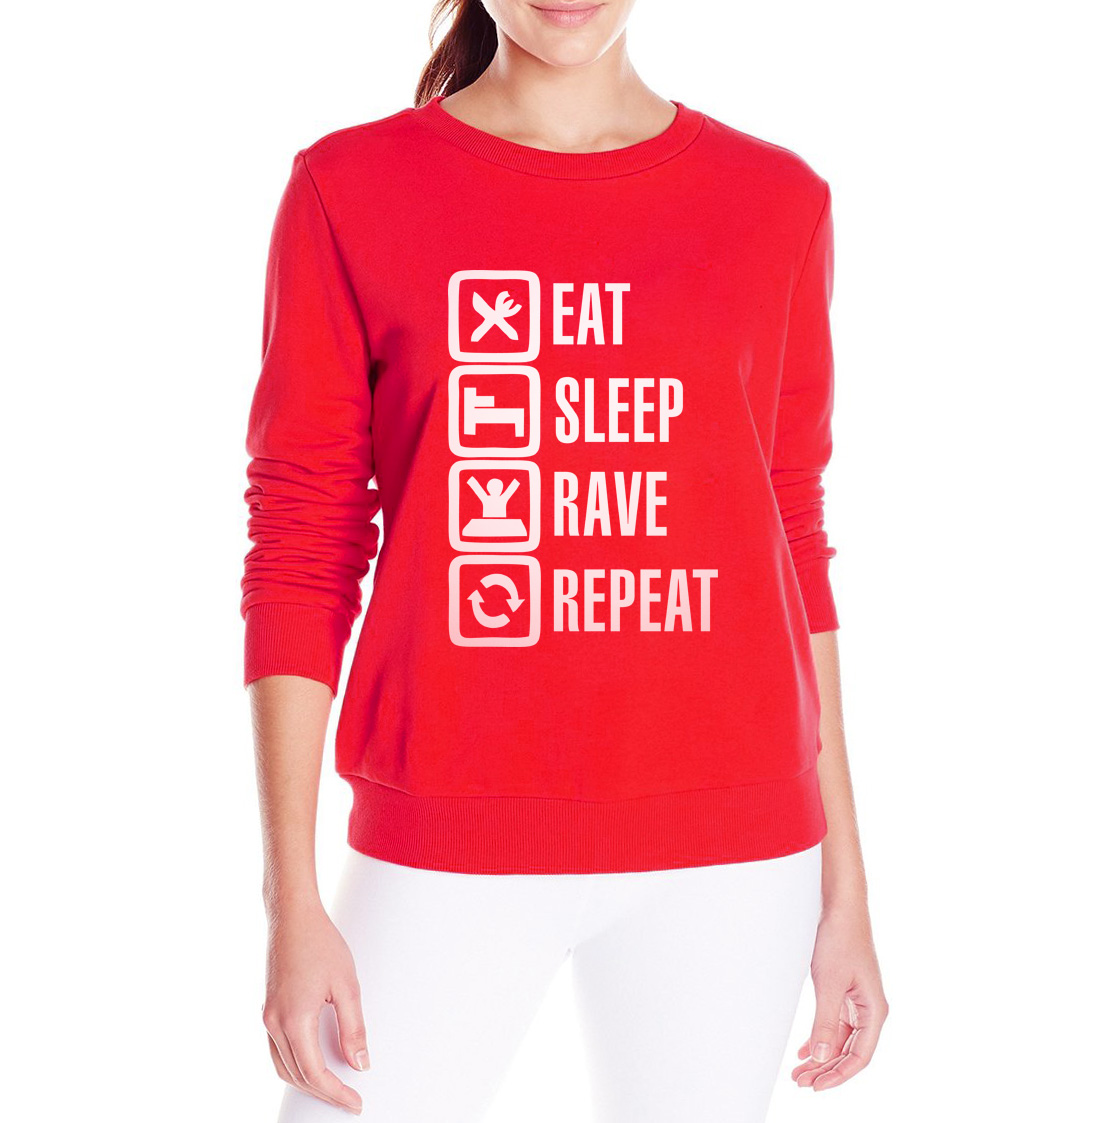 eat sleep rave repeat letter print 2017 autumn women sweatshirt hip hop hoody fashion brand clothing tracksuit black funny suit